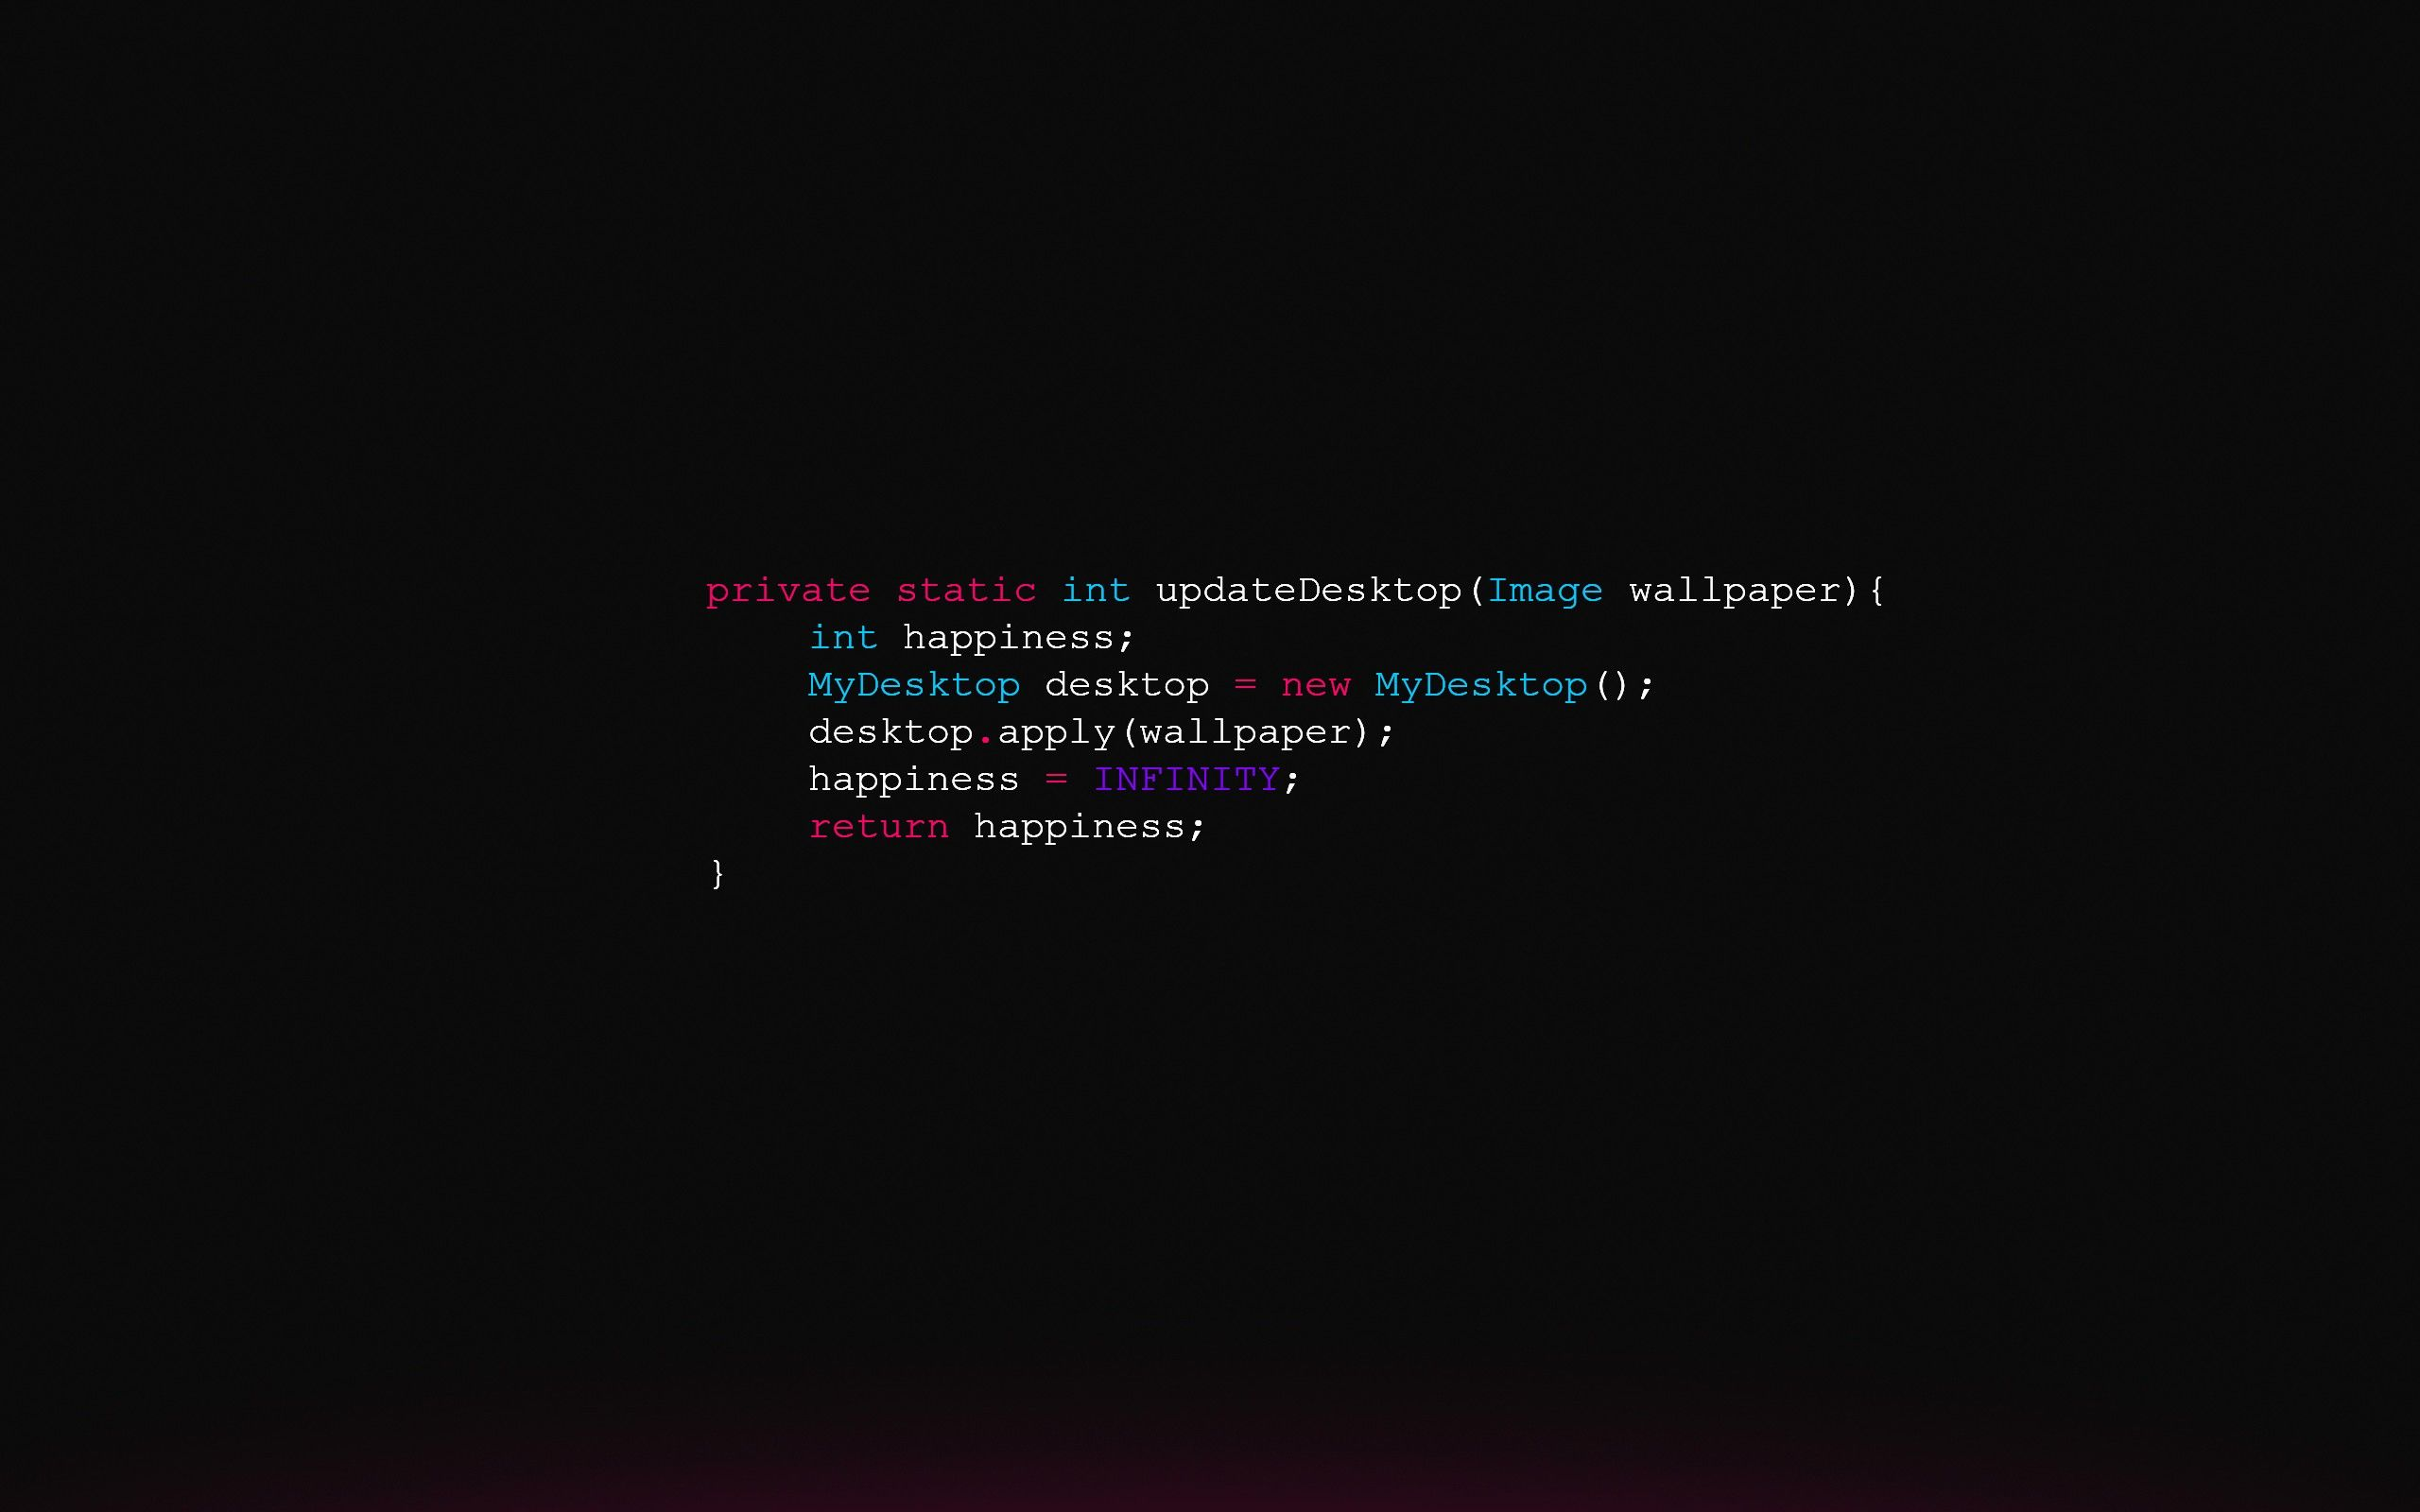 Elegant Programming Hd Wallpapers For Desktop Desktop Wallpaper Wallpaper Hd Wallpaper